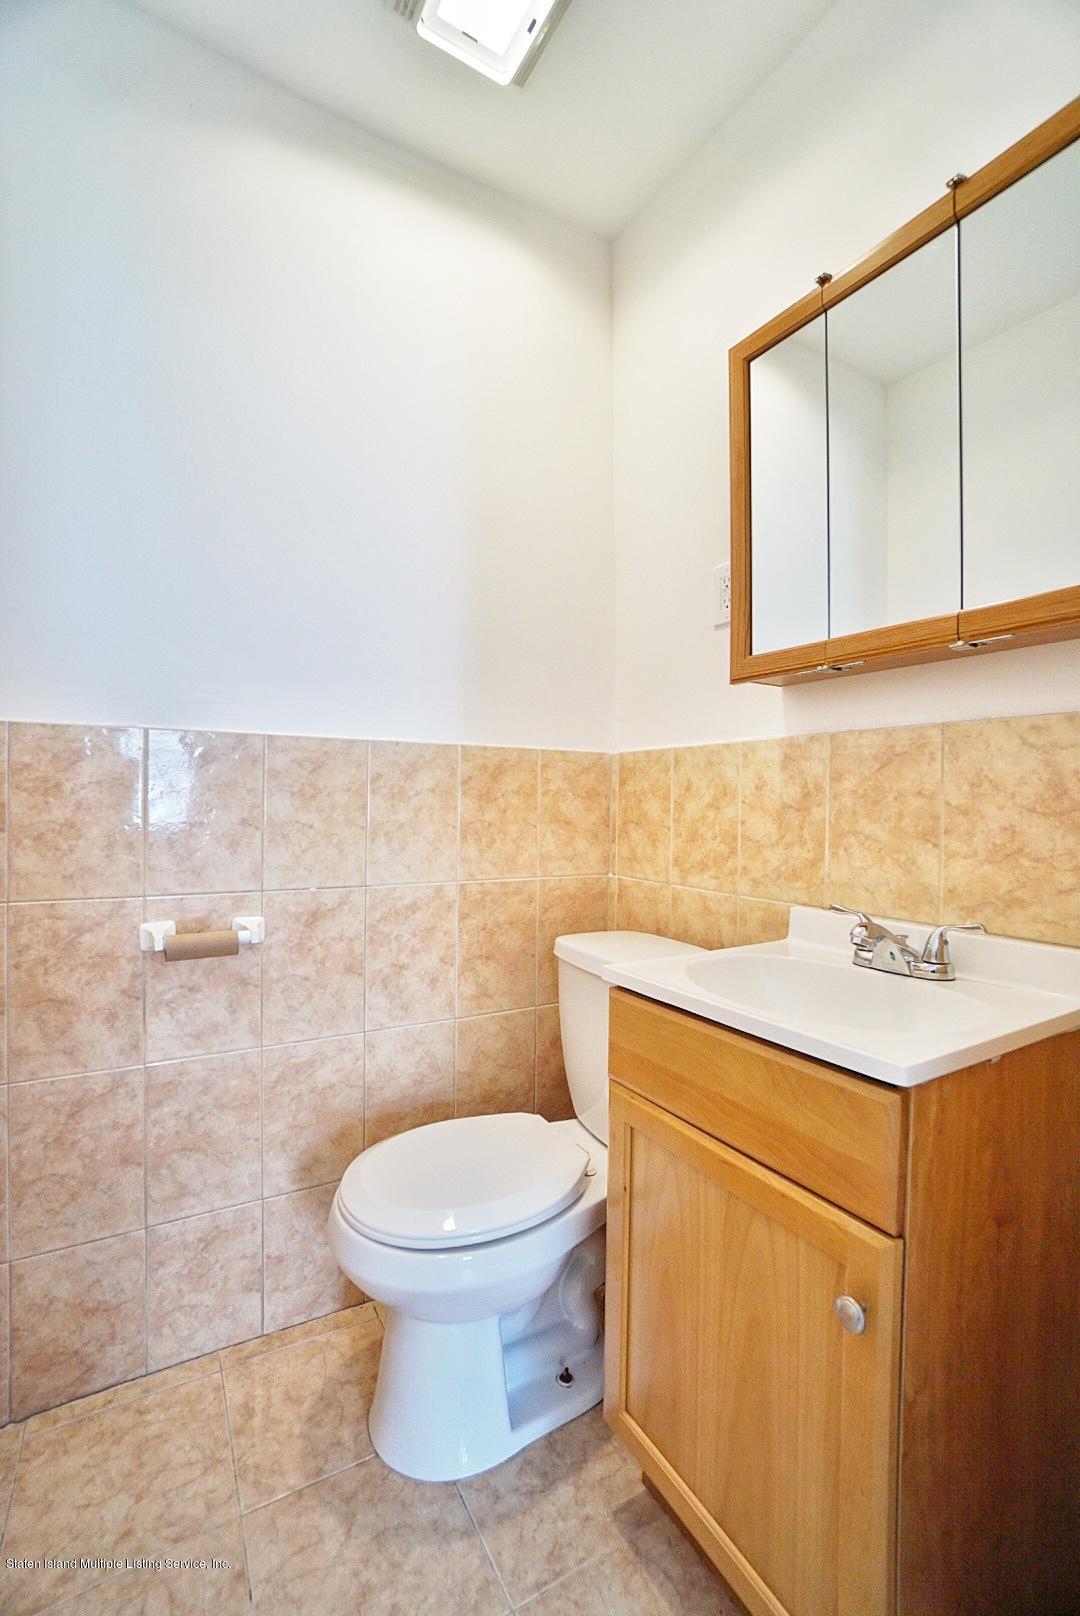 Single Family - Detached 53 Dubois Avenue  Staten Island, NY 10310, MLS-1128749-19